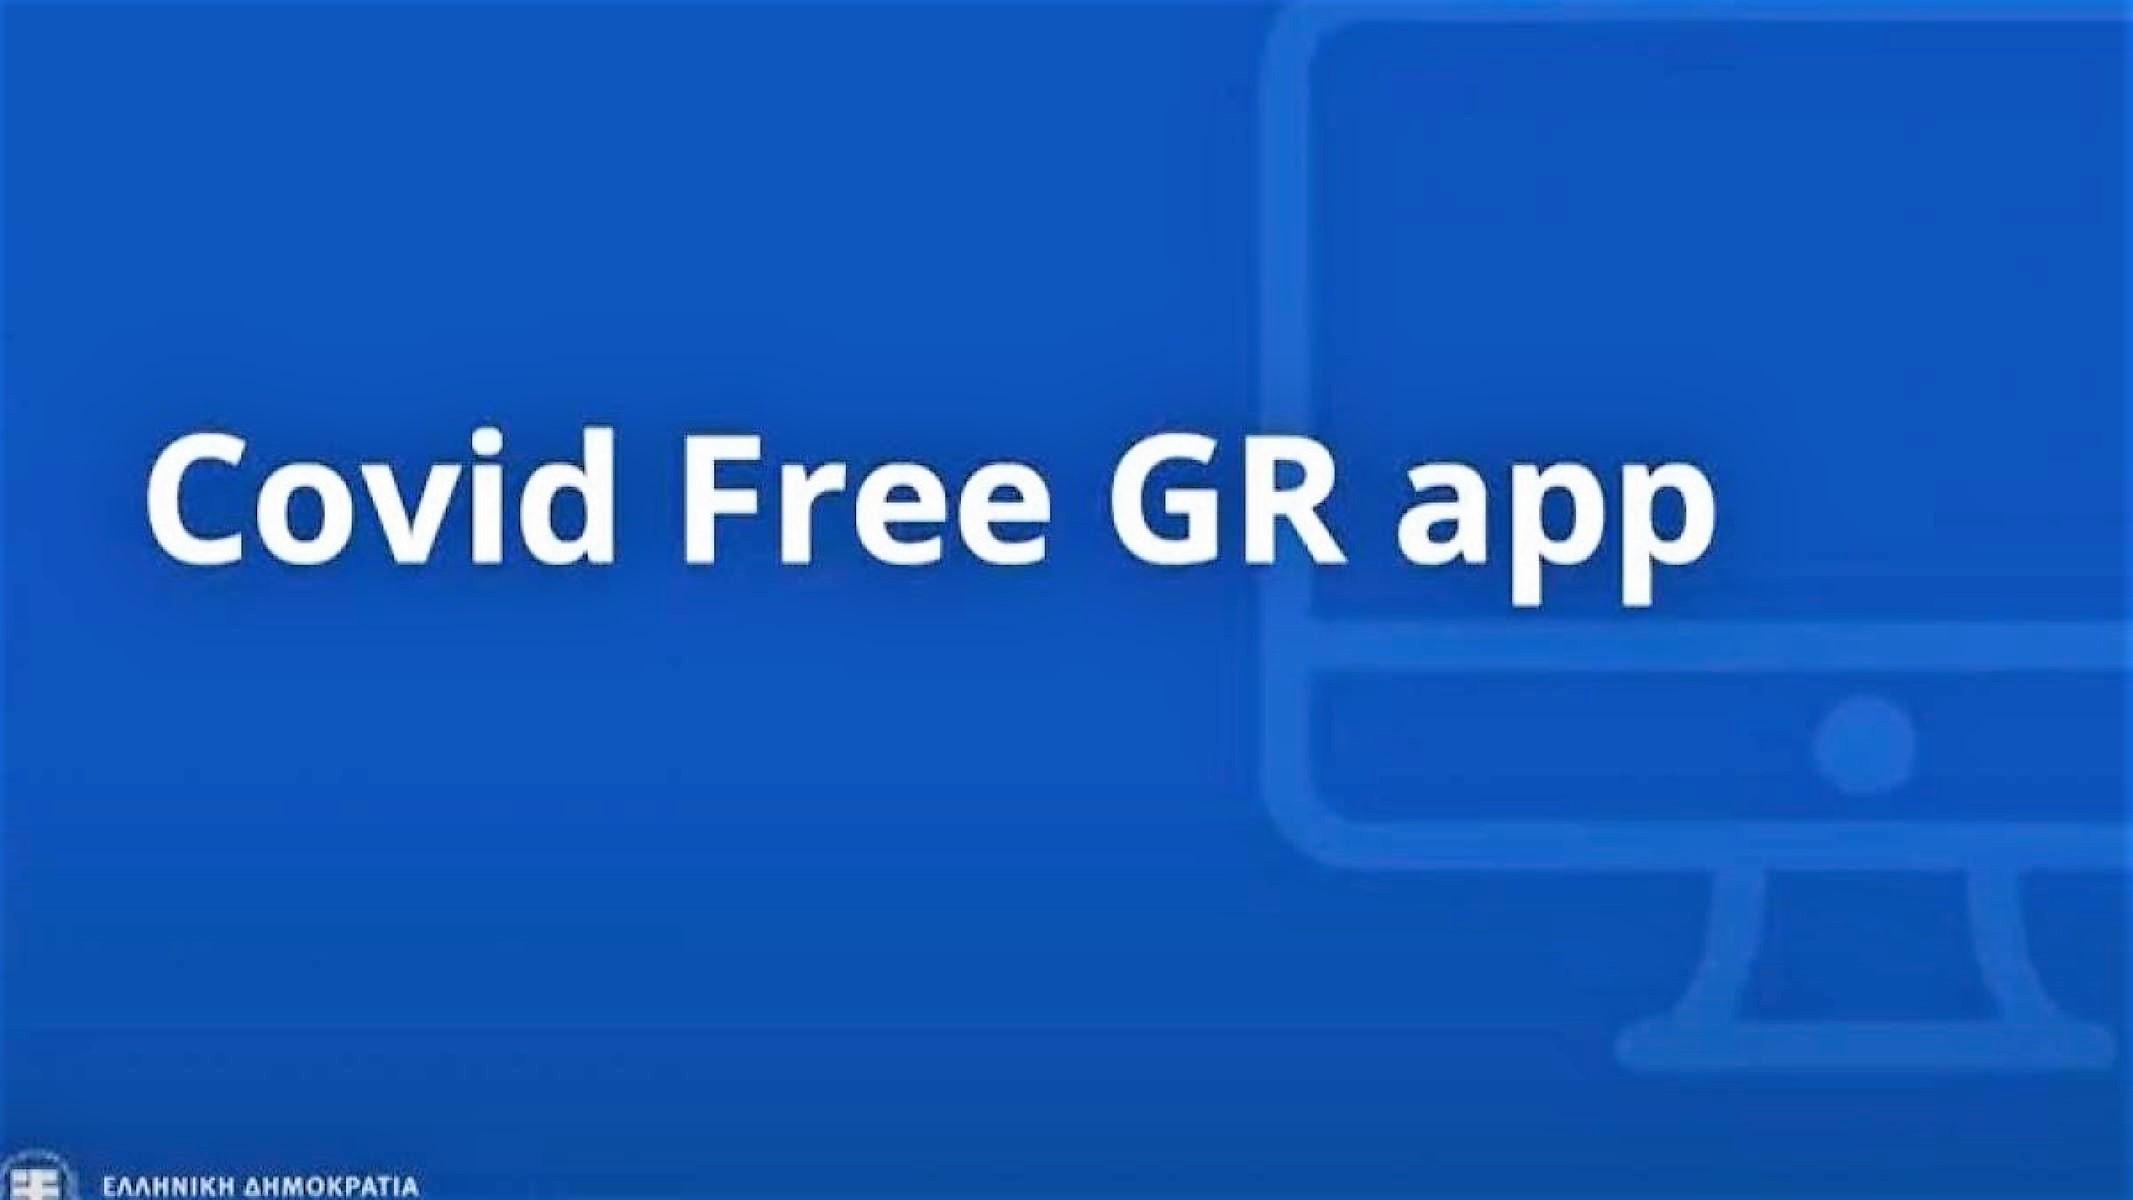 Covid Free GR: Η Κινεζοποίηση της ελληνικής κοινωνίας